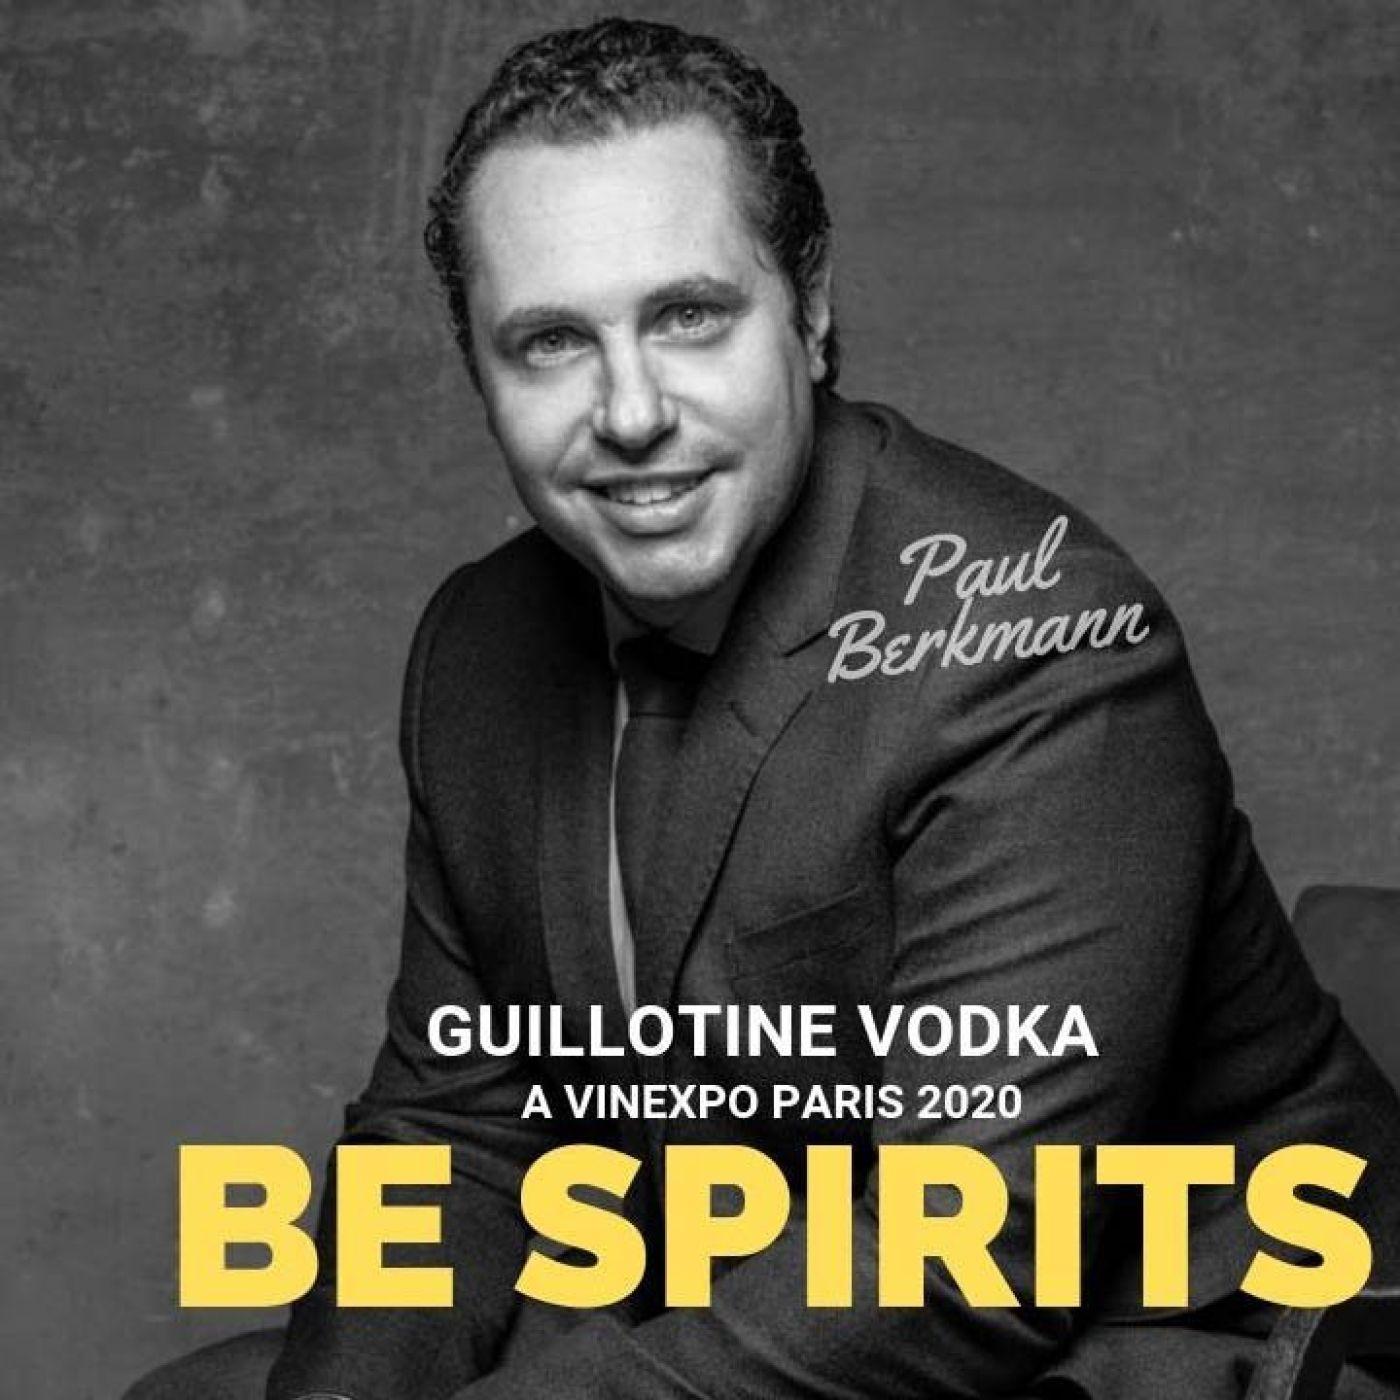 Podcast Infosbar Inside #13 : Guilllotine vodka exposera au salon Be Spirits by Vinexpo Paris